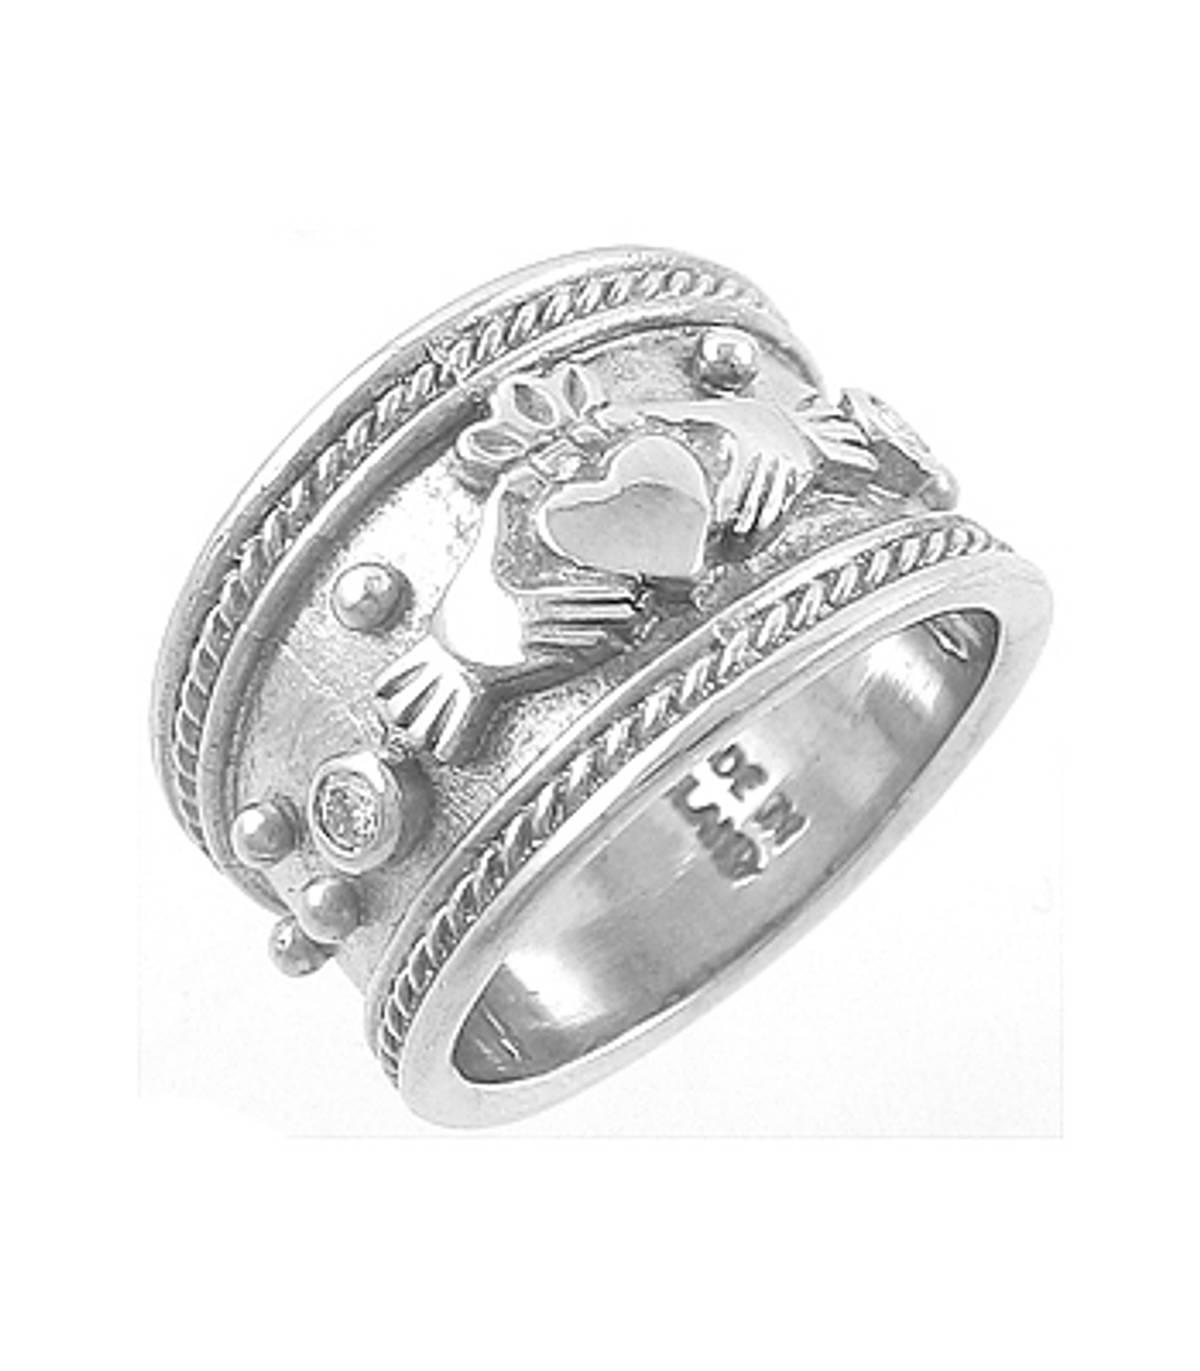 Irish made14 carat white gold 0.06cts diamonds claddagh engagement ring